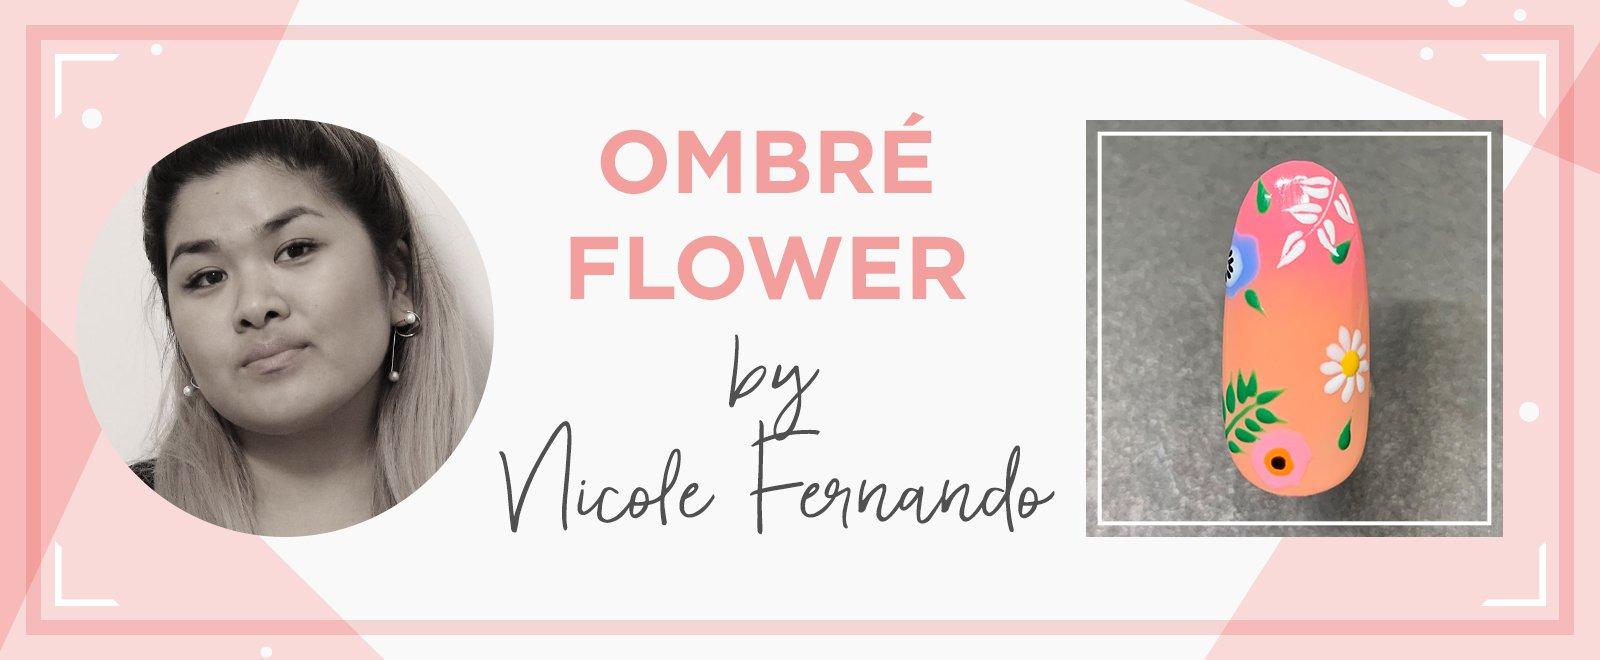 SBS_header_template_1600x660_ombre-flower_Nicole-Fernando